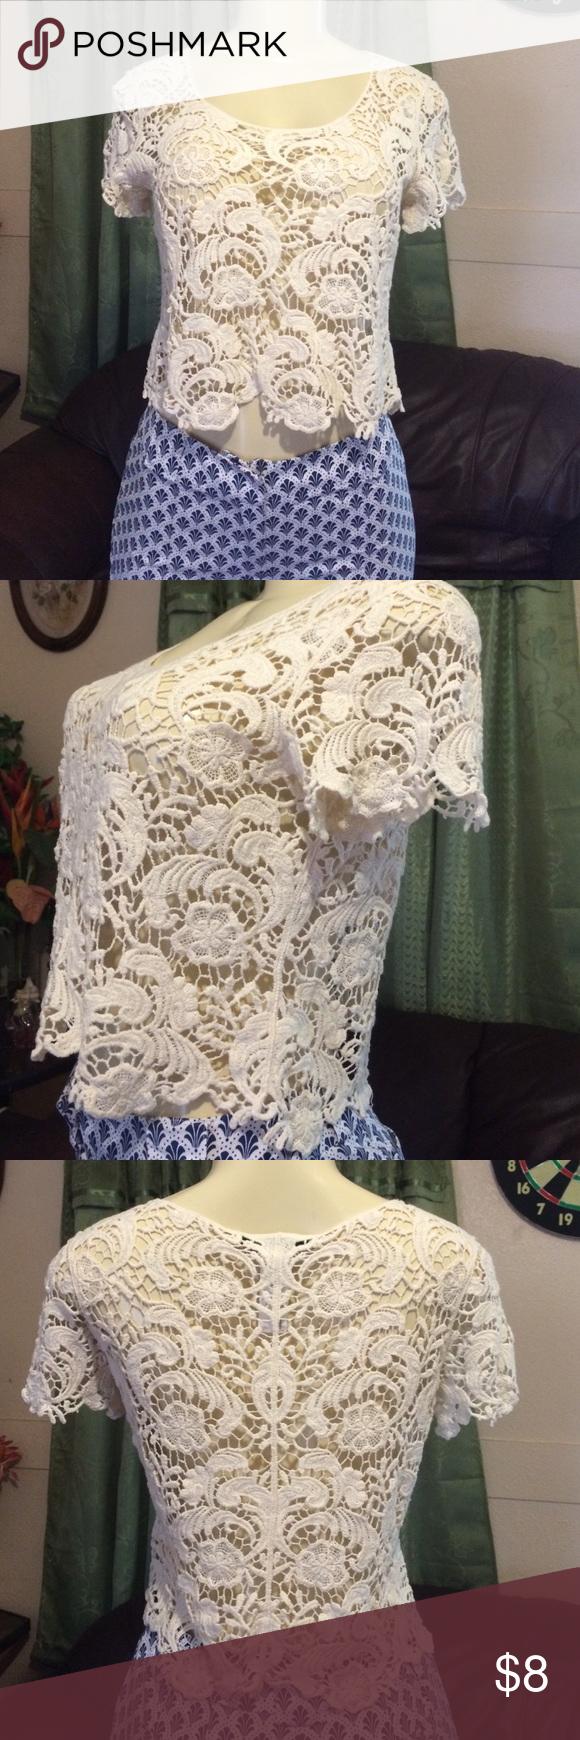 FOREVER 21. Crochet crop top Short sleeves crochet crop top Forever 21 Tops Crop Tops